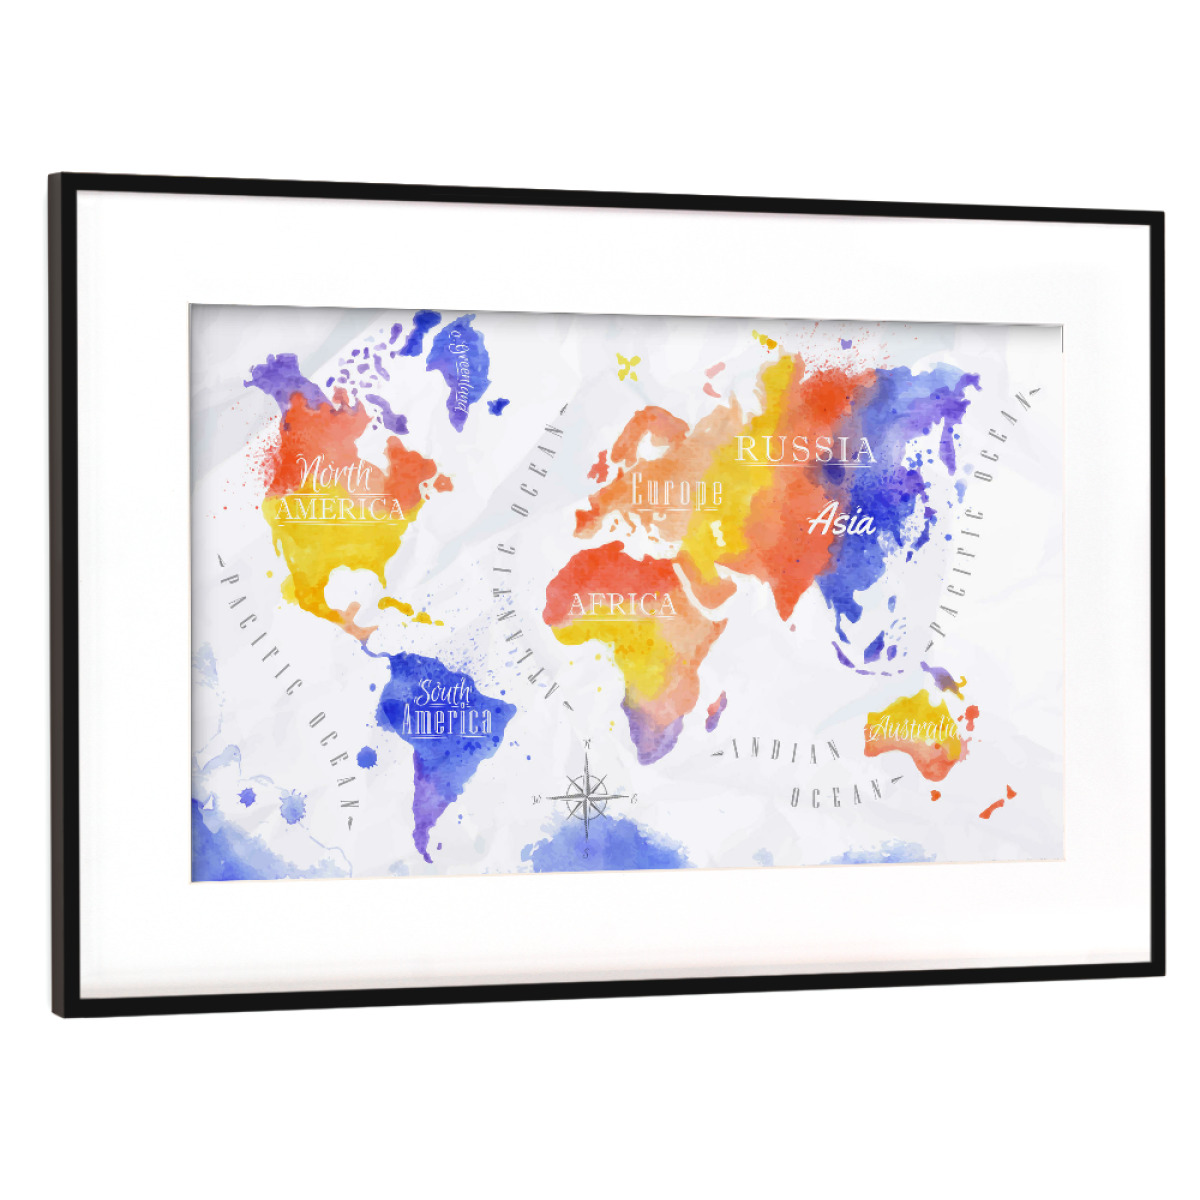 Aquarell Weltkarte rot lila als Gerahmt bei artboxONE kaufen